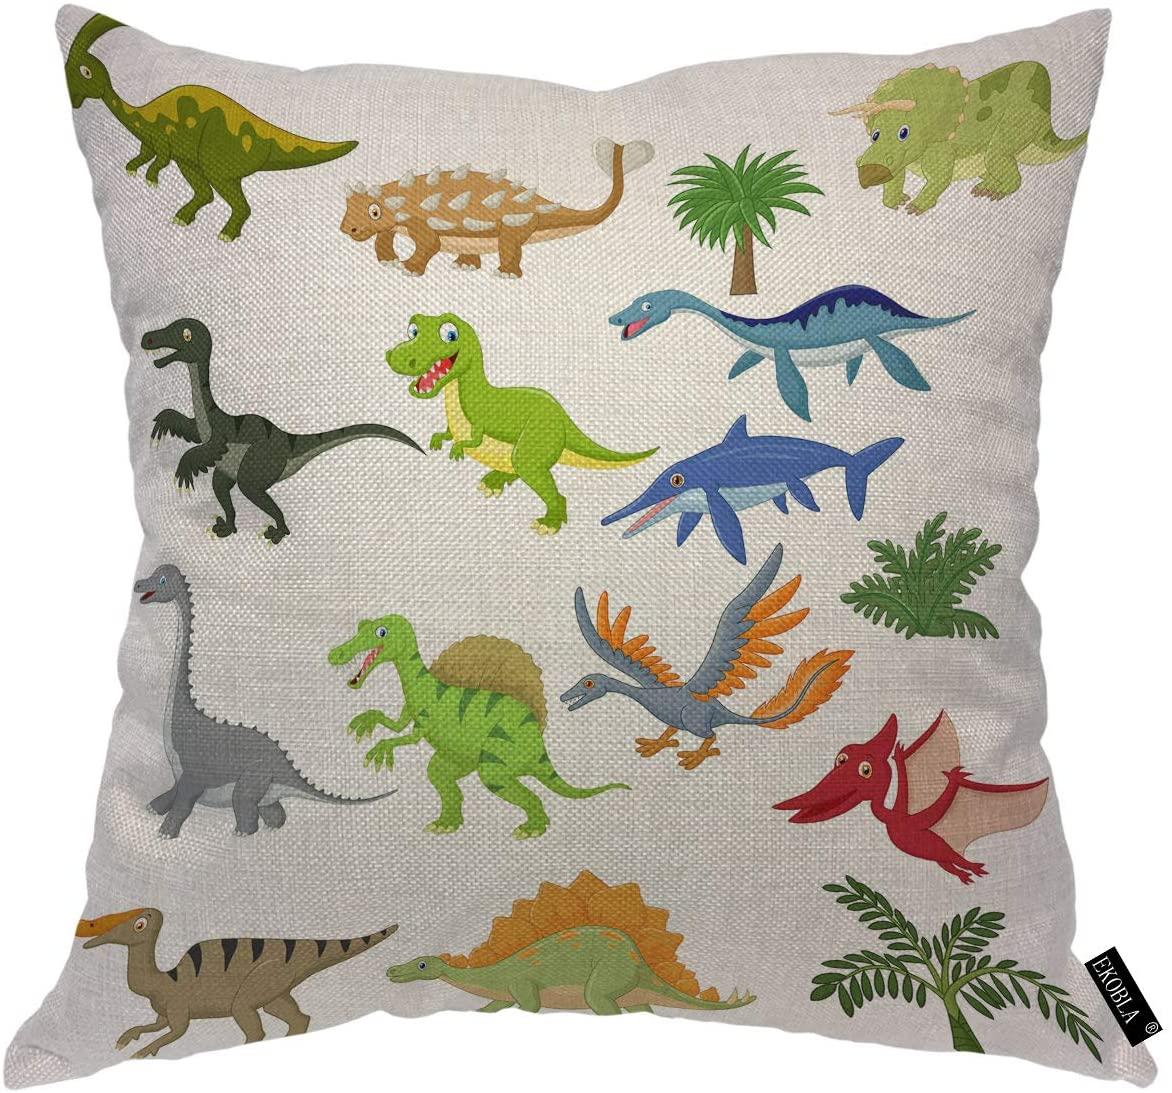 EKOBLA Dinosaur Throw Pillow Covers Comic Cute Cartoon Flying Giant Carnivorous Amusing Animals Beast Decorative Square Cushion Case for Men Women Boys Girls Home Decor Cotton Linen 16x16 Inch